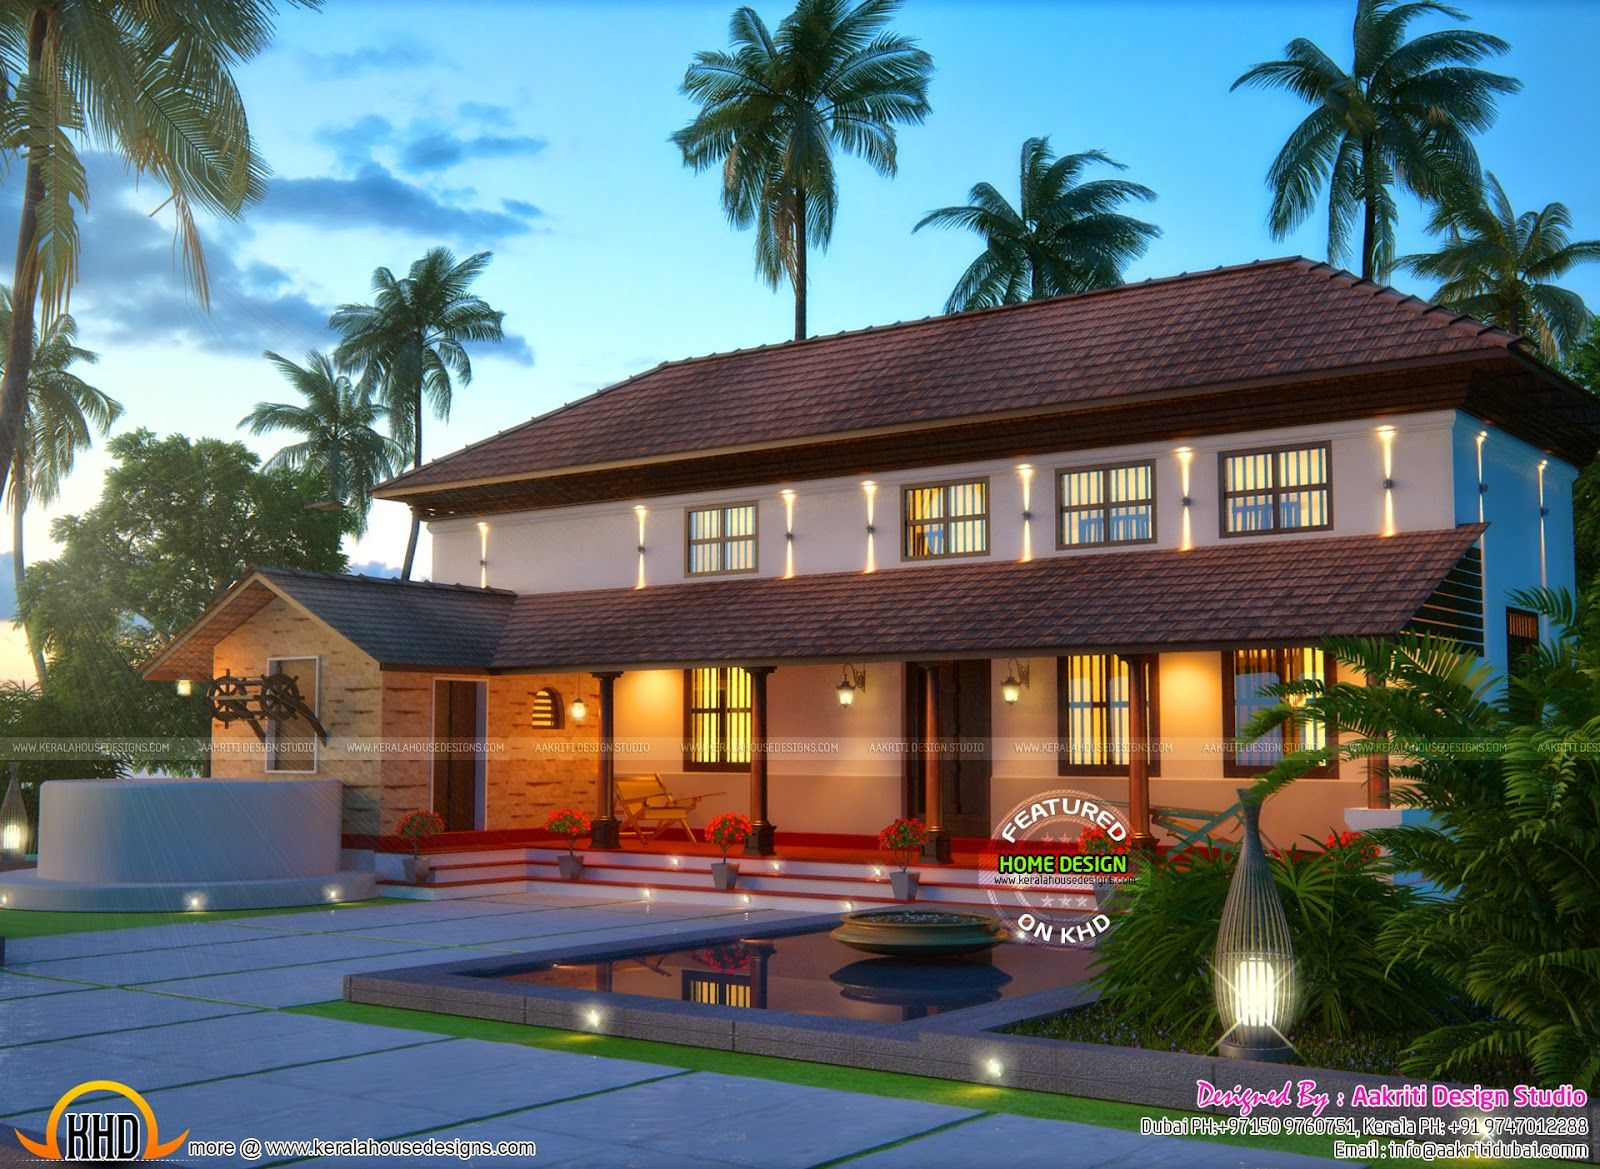 Pure Kerala Traditional Farmhouse | Kerala, Traditional and House ... for Farmhouse Kerala  150ifm